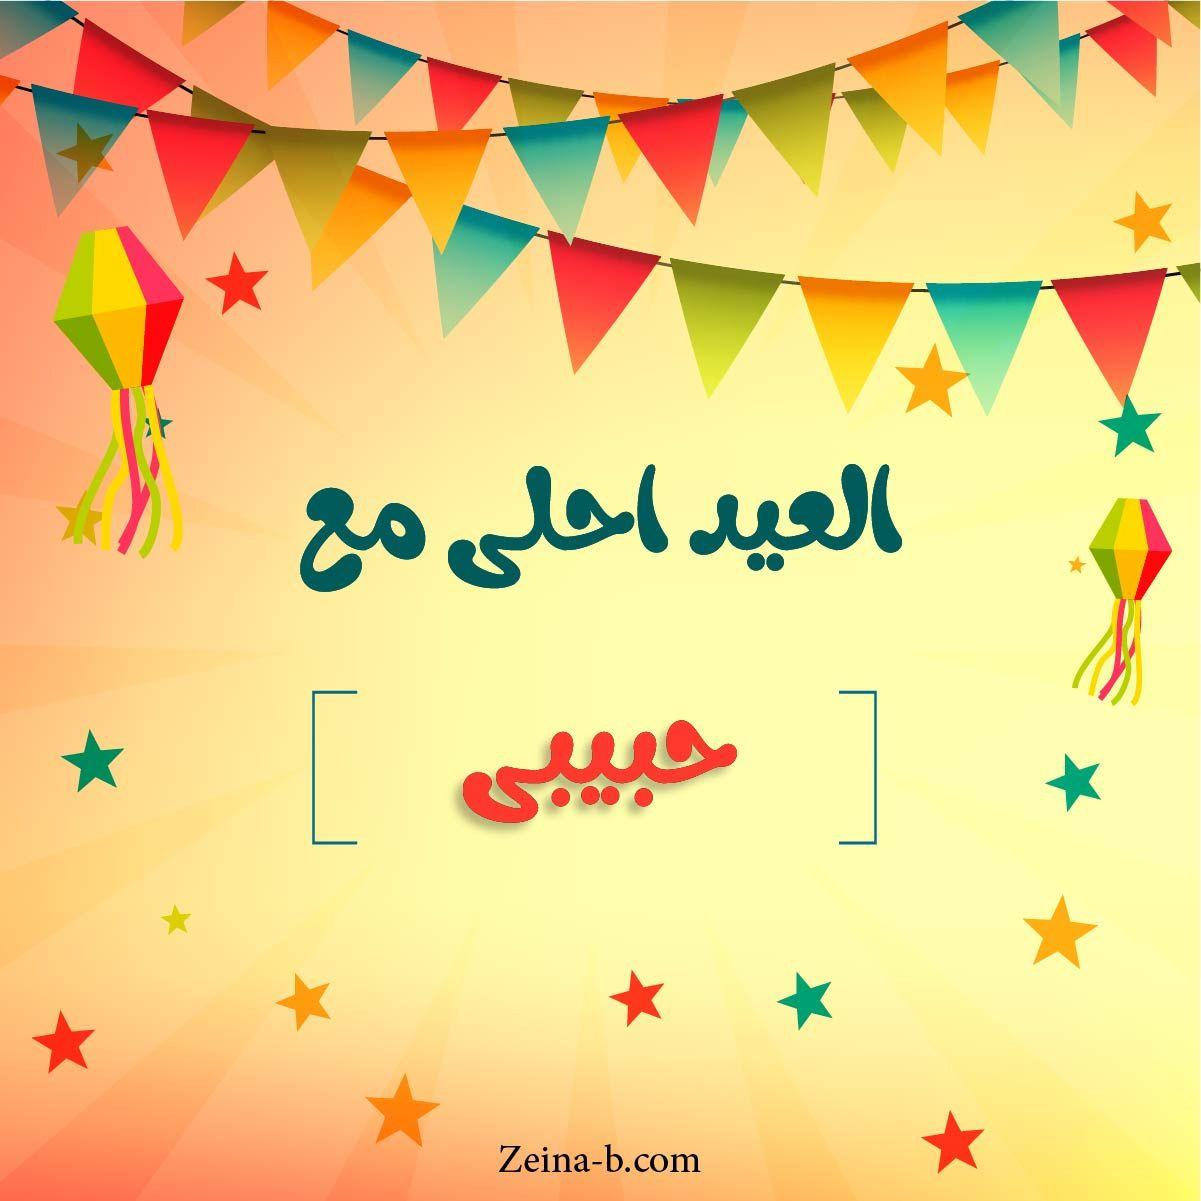 العيد احلى مع حبيبى Home Decor Decals Happy Eid Home Decor